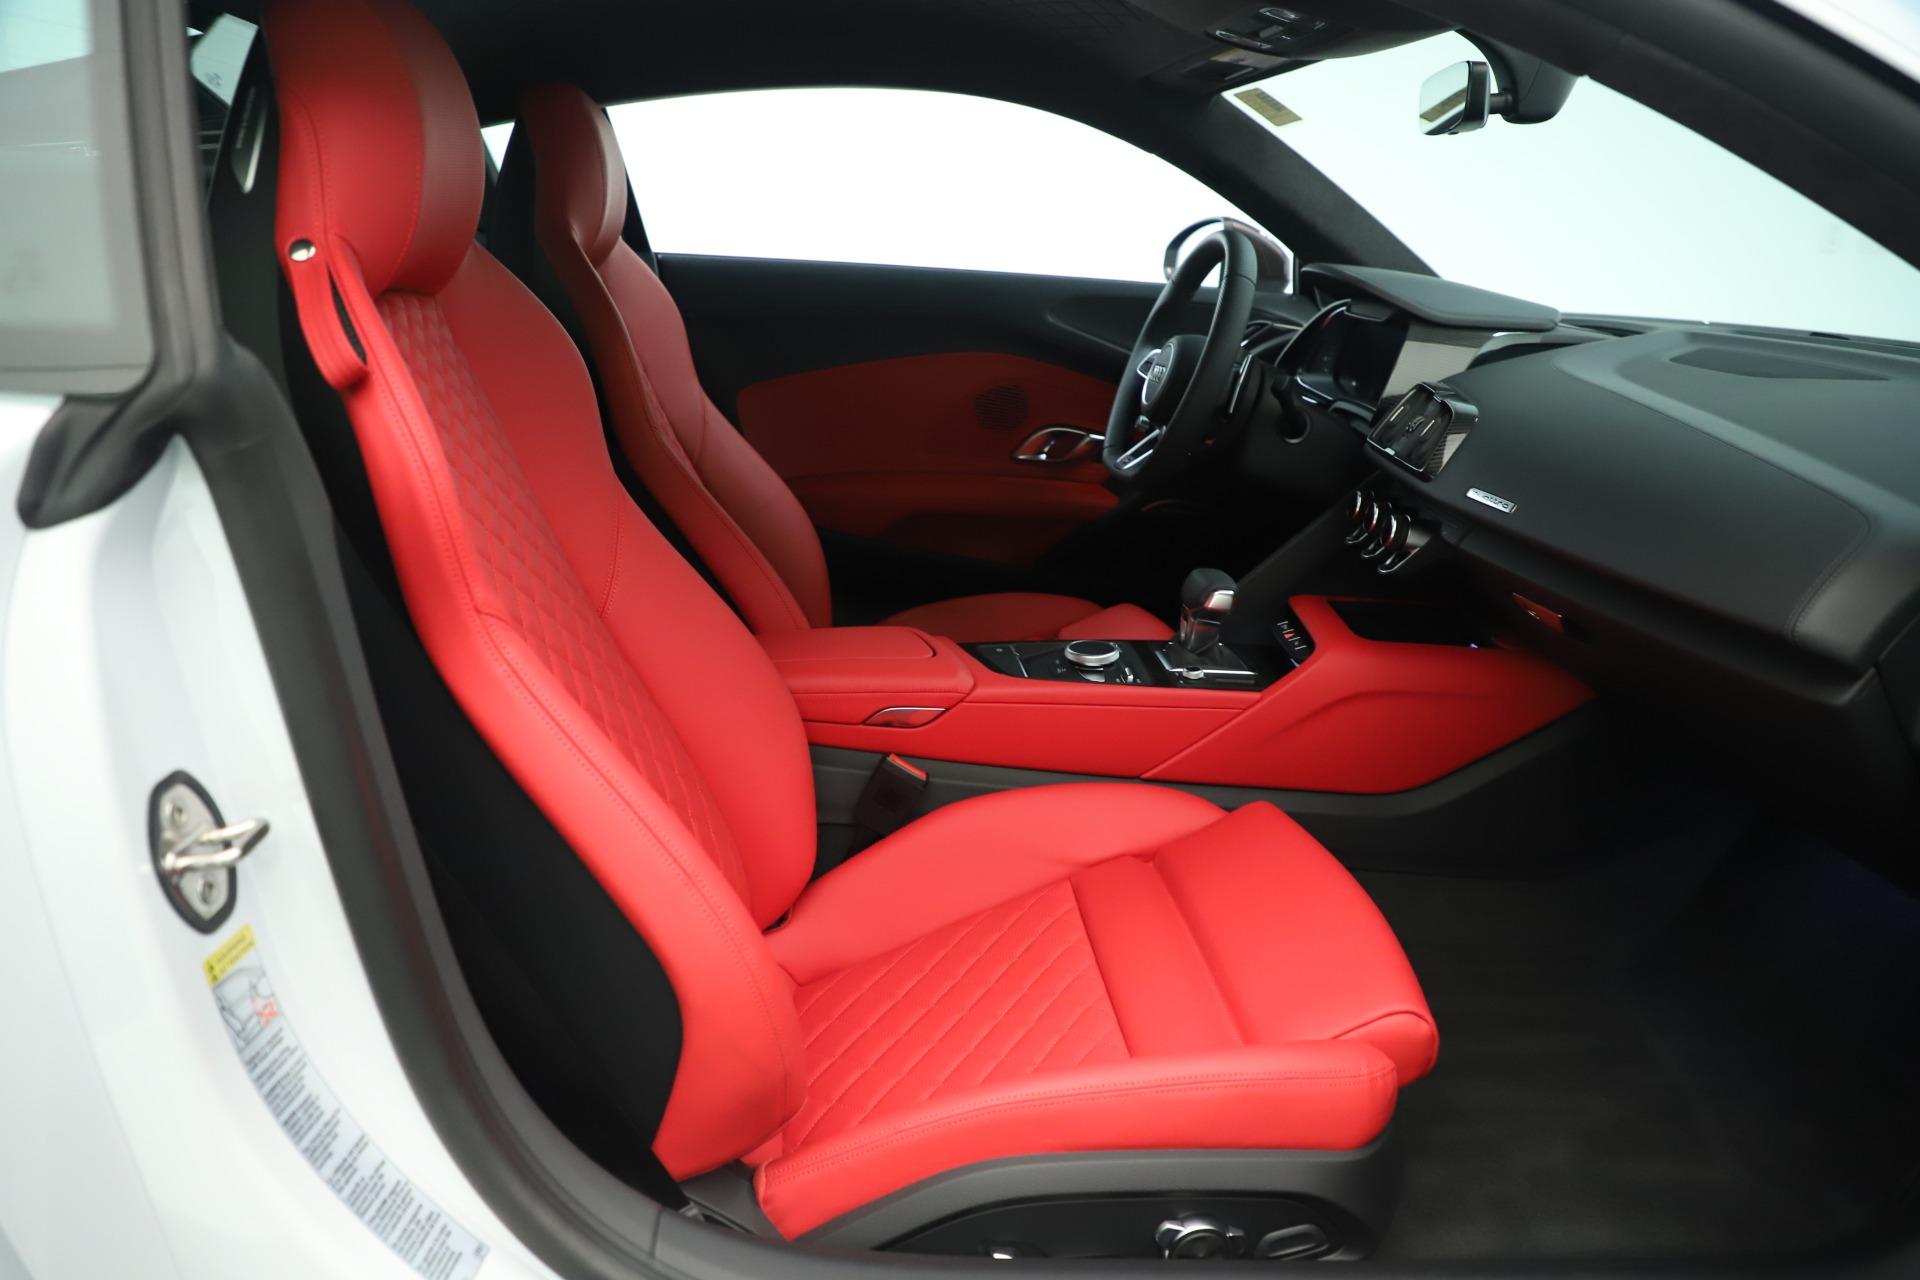 Used 2018 Audi R8 5.2 quattro V10 Plus For Sale In Greenwich, CT 3360_p19